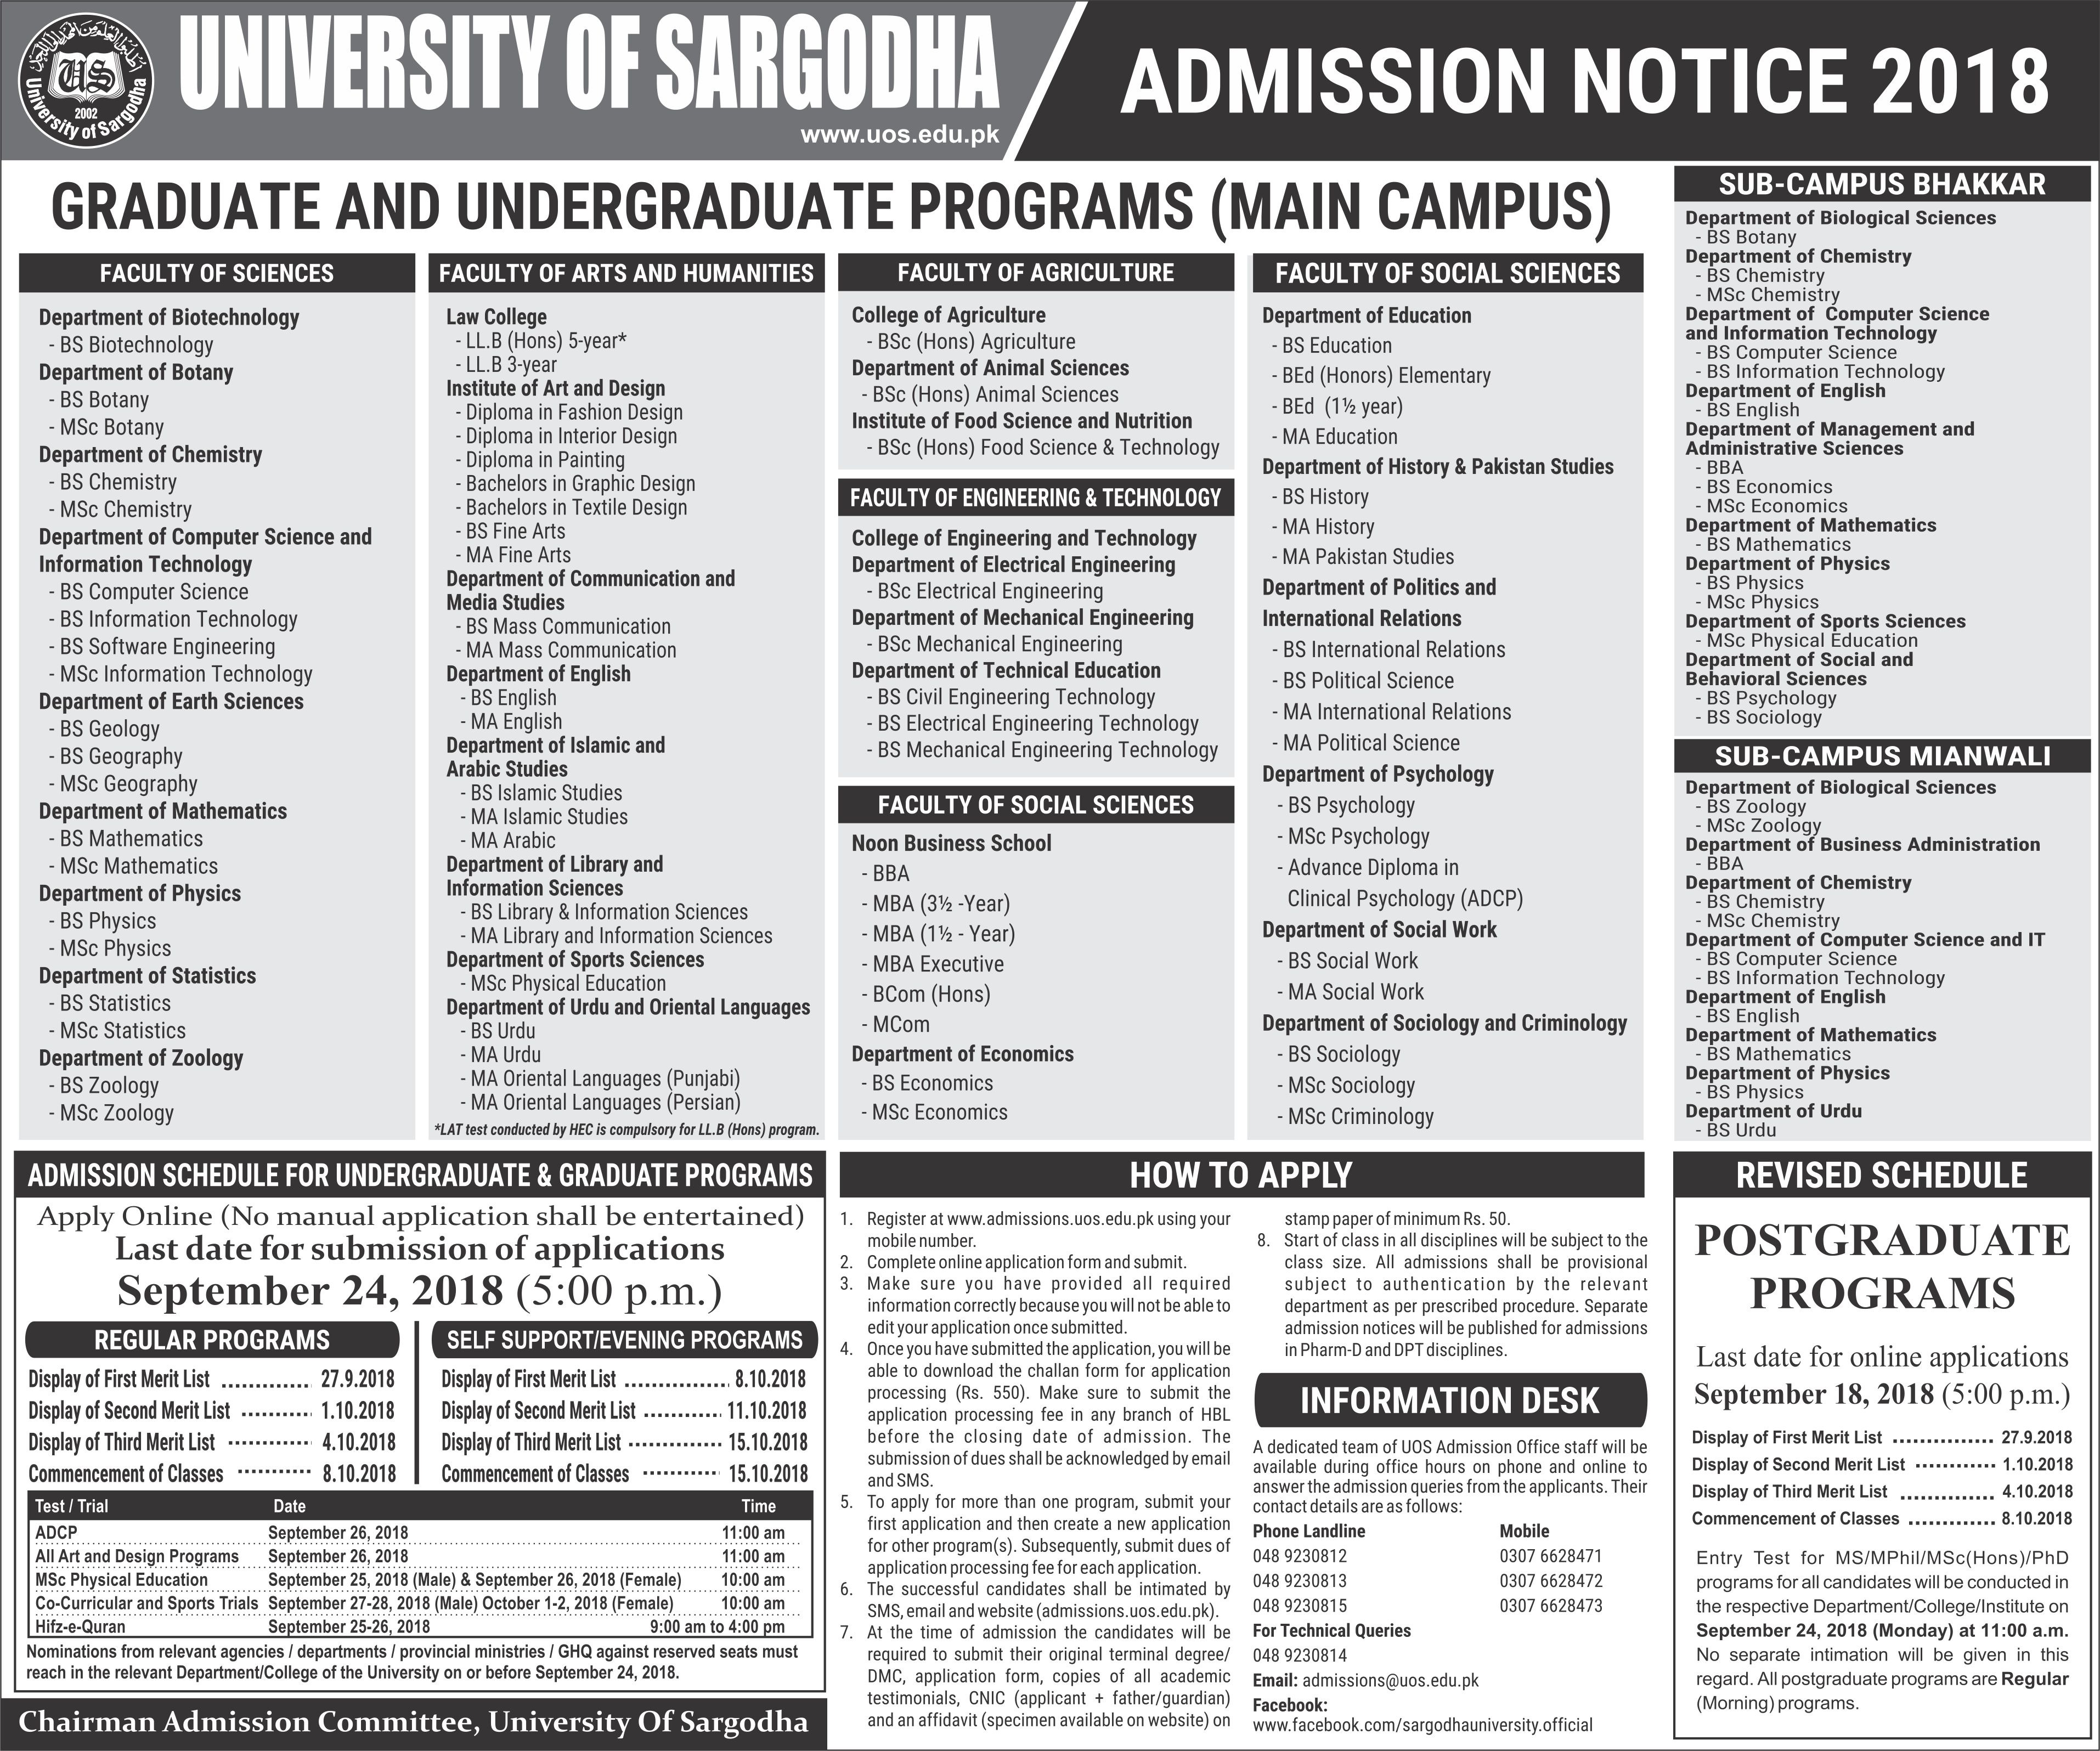 University of Sargodha Admissions 2019 uos Online